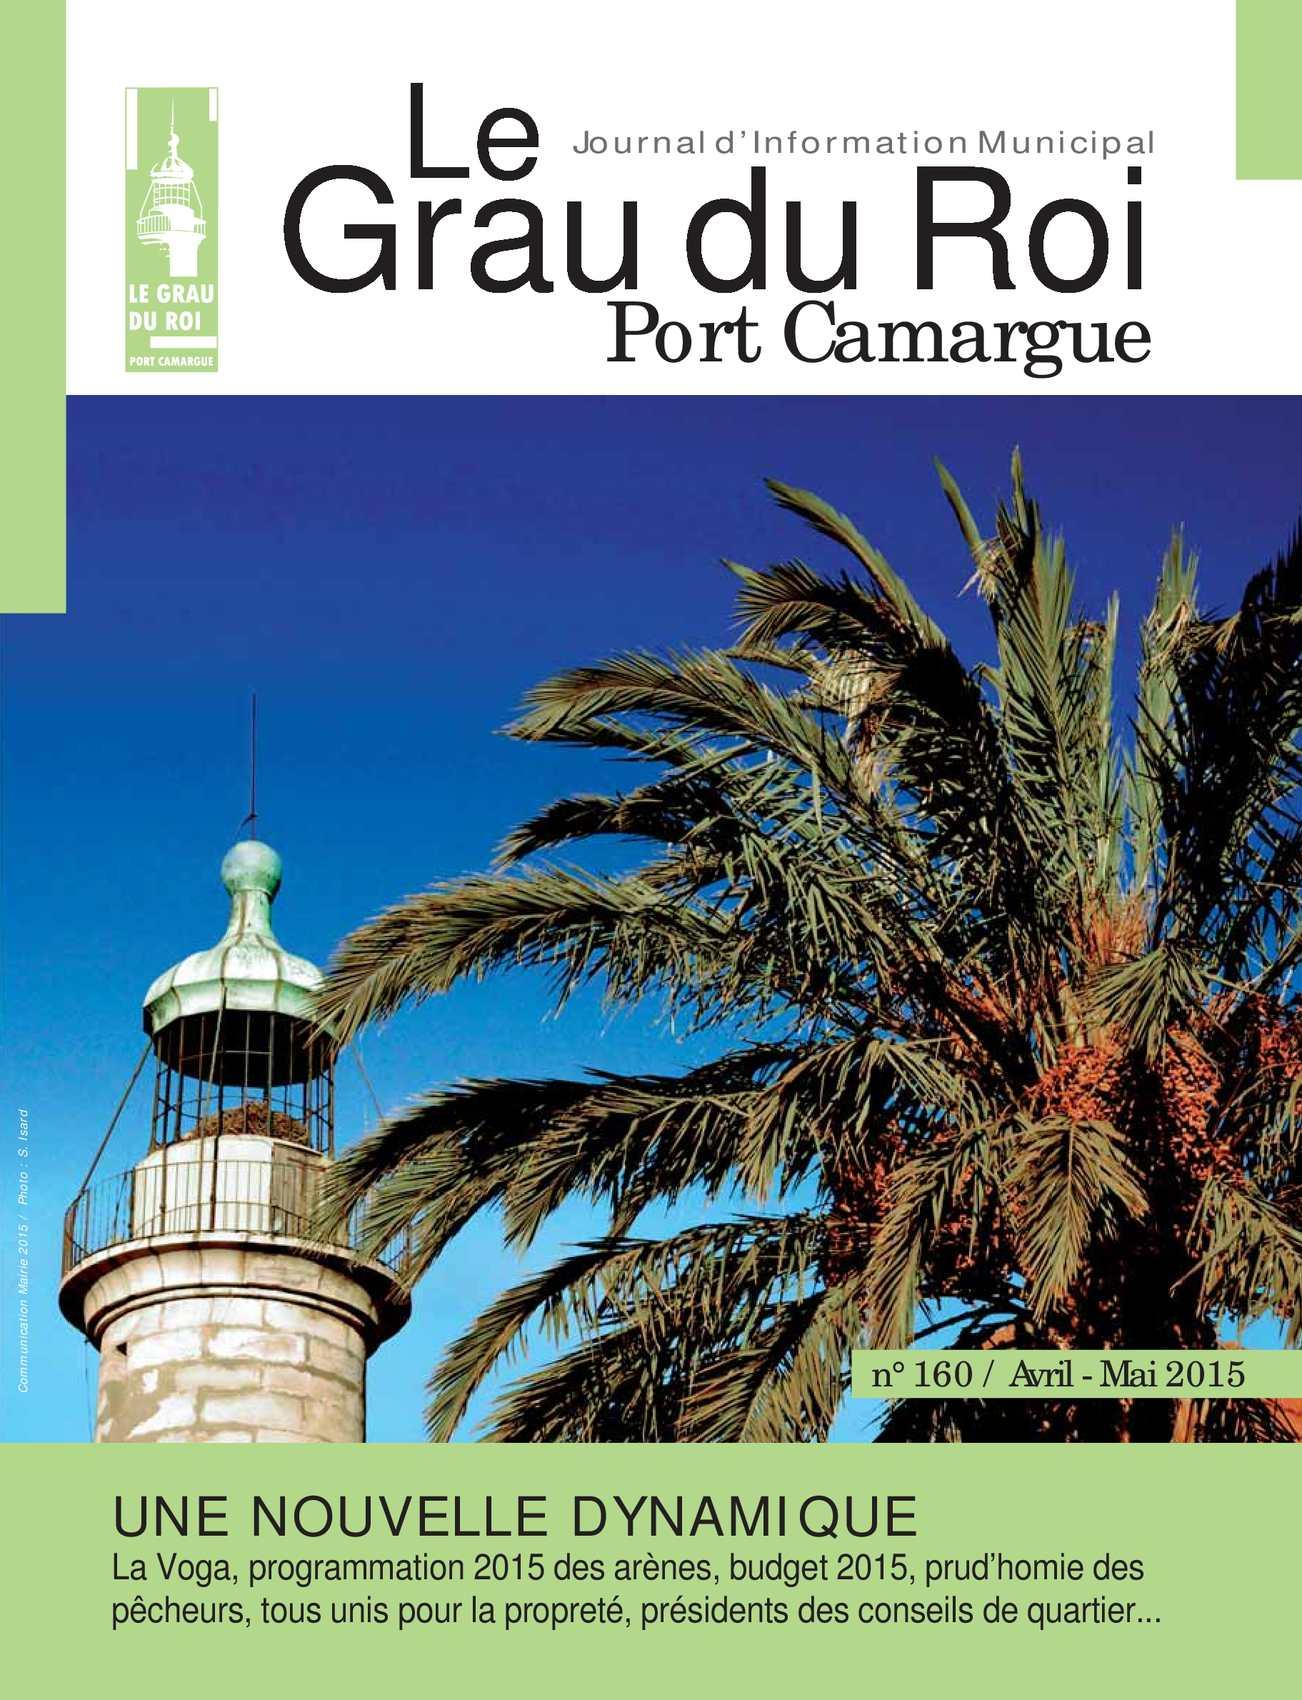 Calam O Le Grau Du Roi Port Camargue Journal D